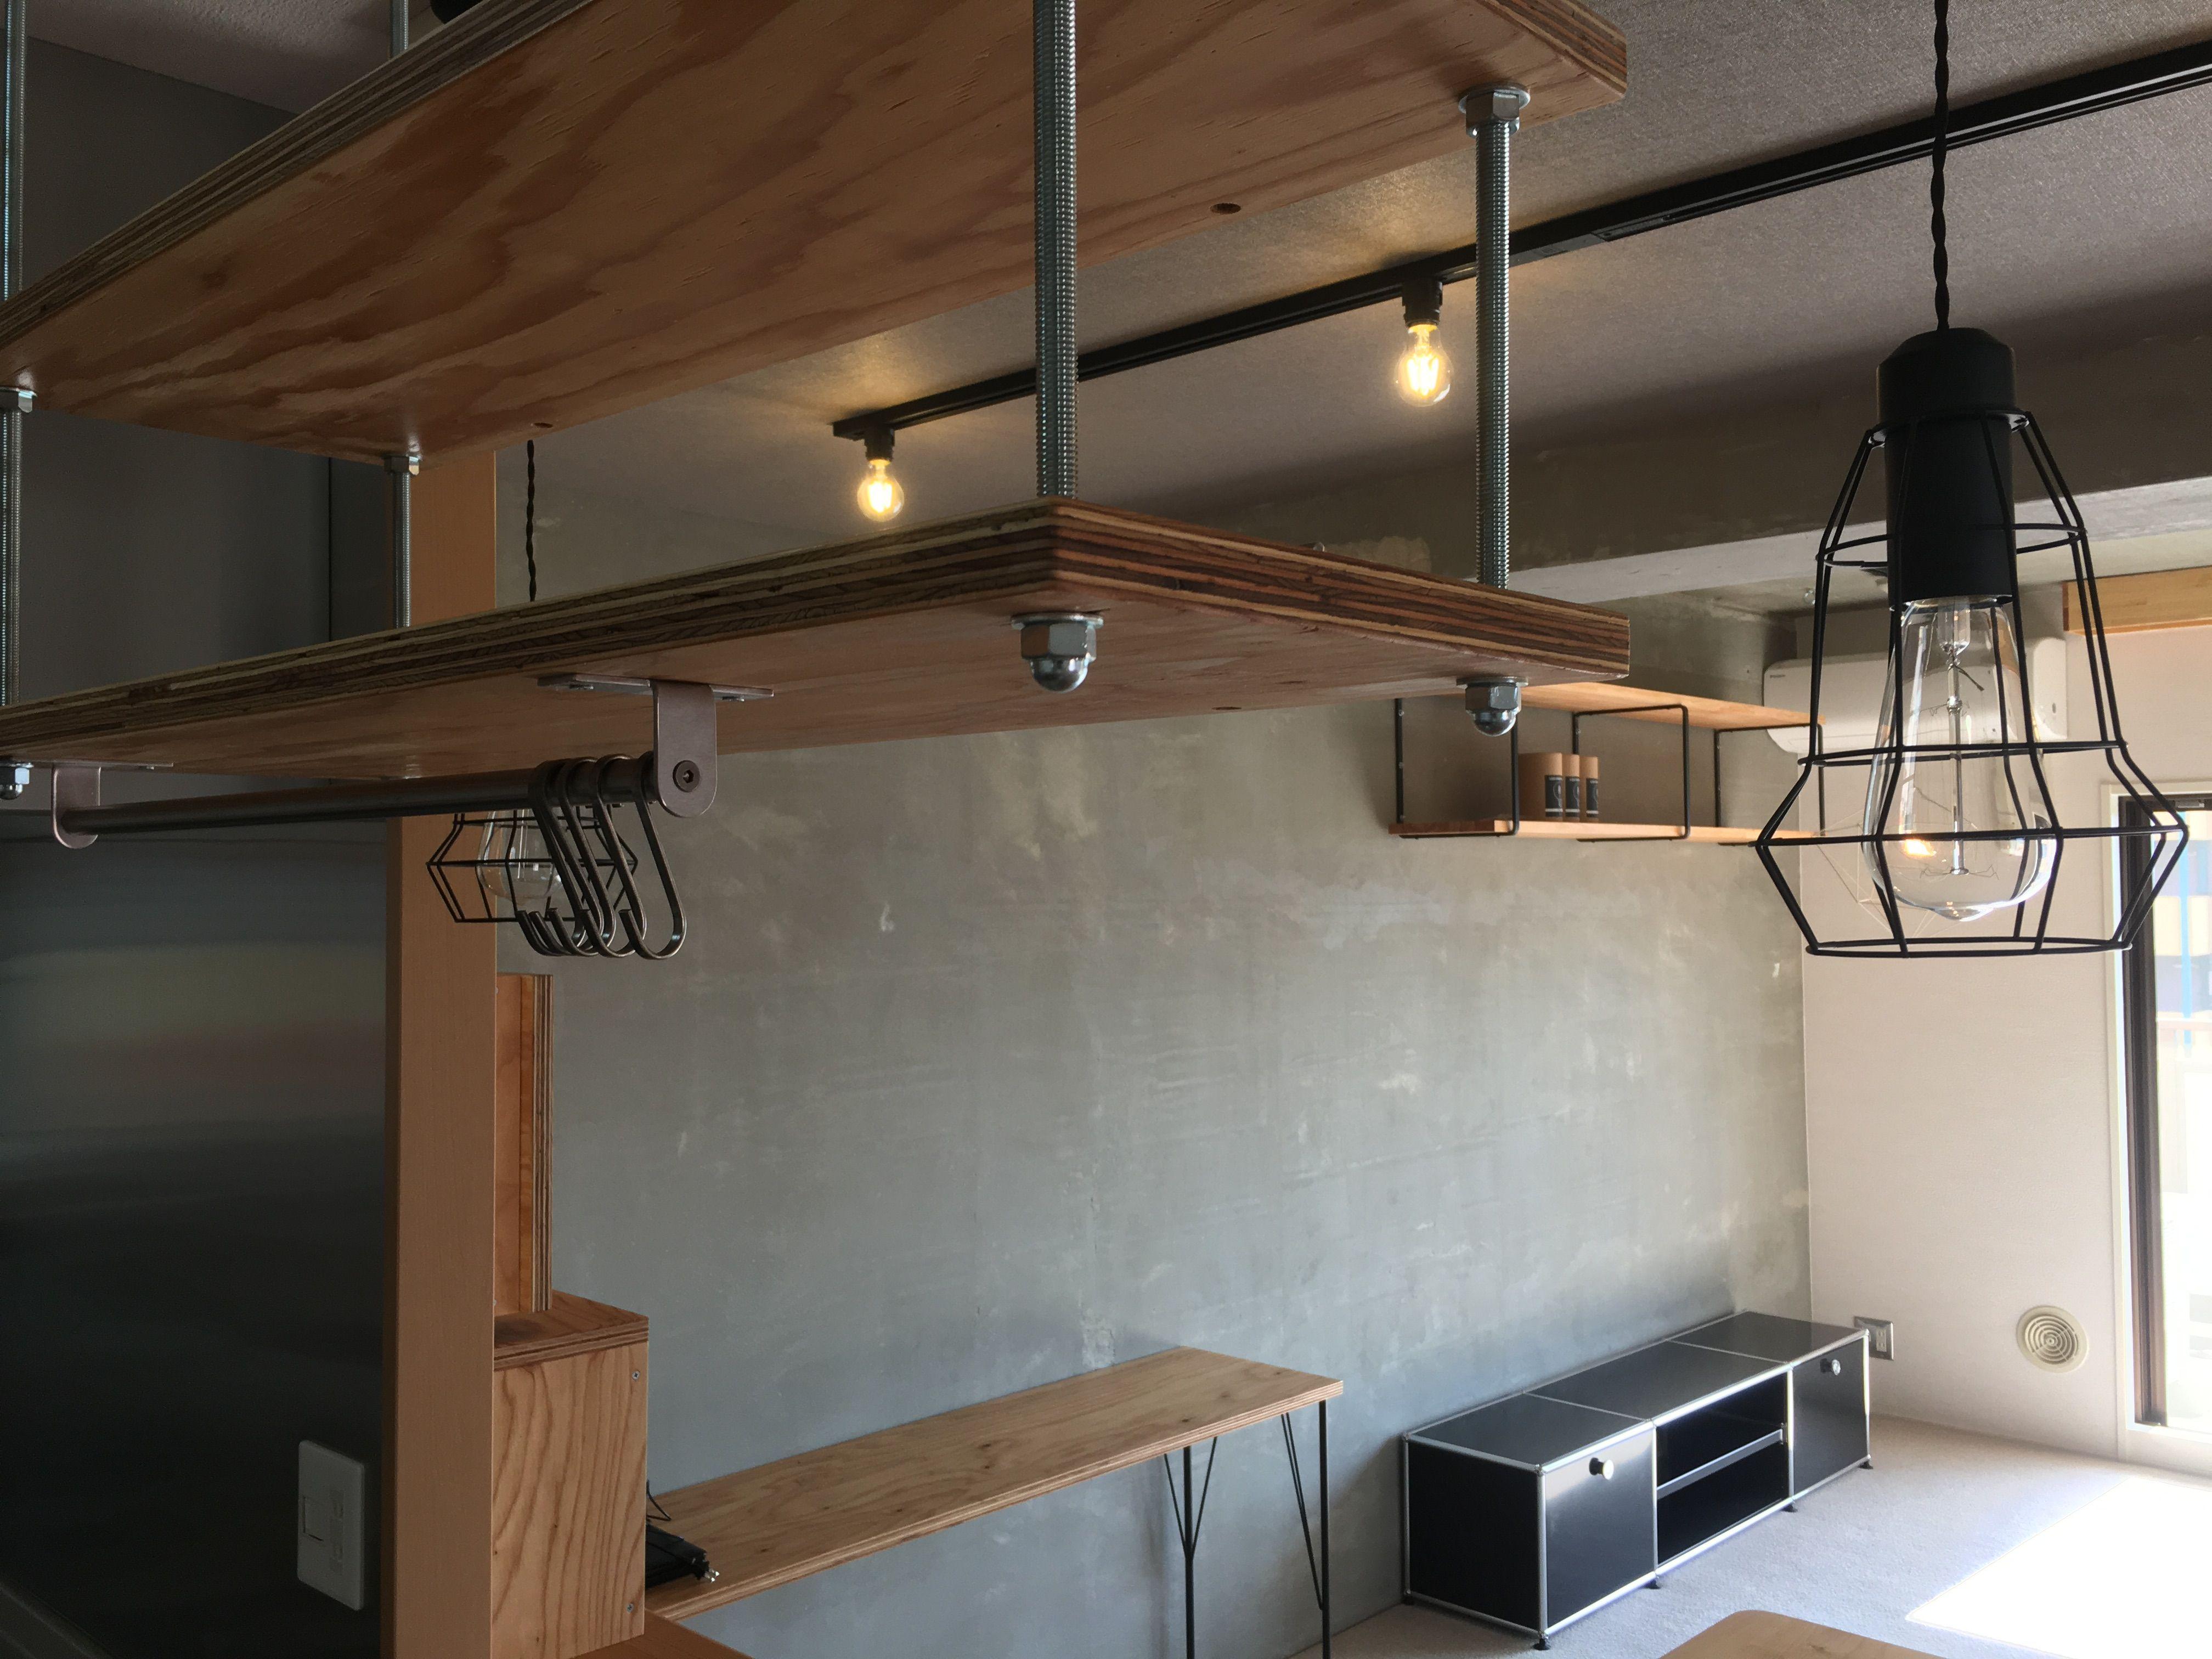 Family Base コンクリートむき出しの壁や梁に露出配管とハード系のマンションリノベーション リビングに隣接したお部屋には小上り家具 収納付 を設置して季節モノの収納やオモチャの収納を確保しつつ上部ではみんなのゴロ リノベーション リビング リノベーション